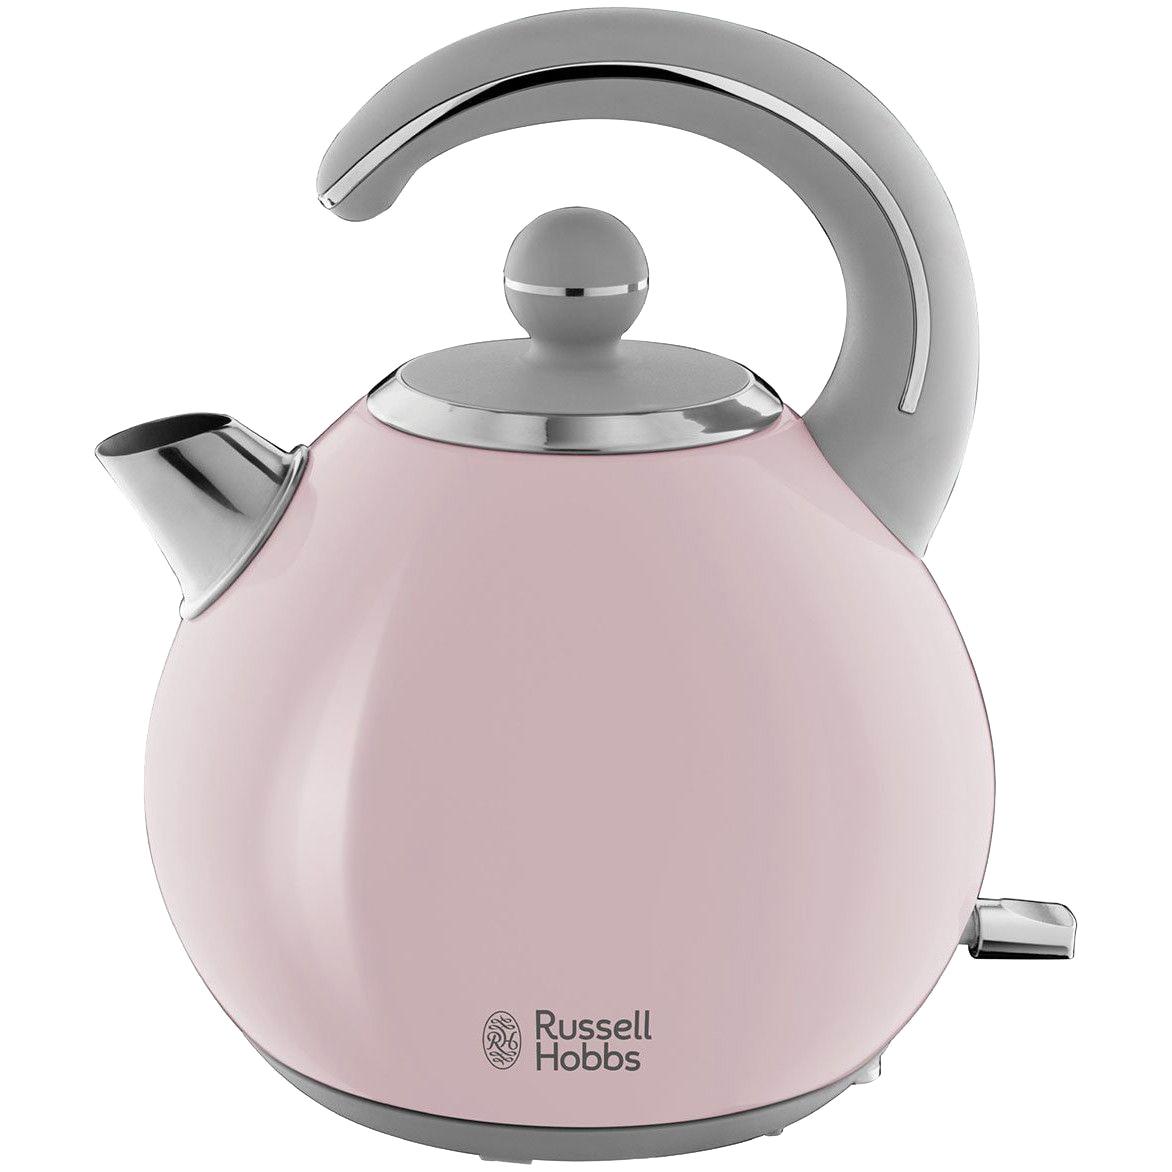 Fotografie Fierbator Russell Hobbs Bubble Soft Pink 24402-70, 2300 W, 1.5 L, Inox, Roz